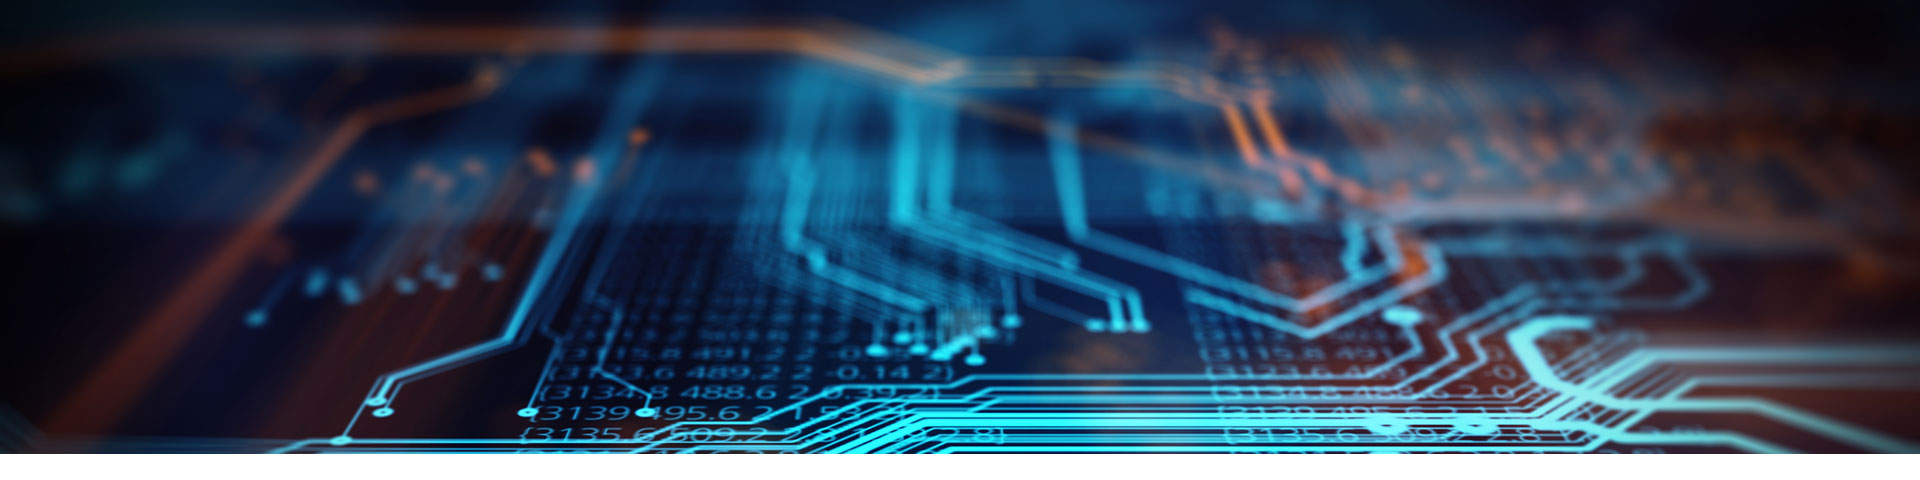 FPGA Design Services - FPGA Programming